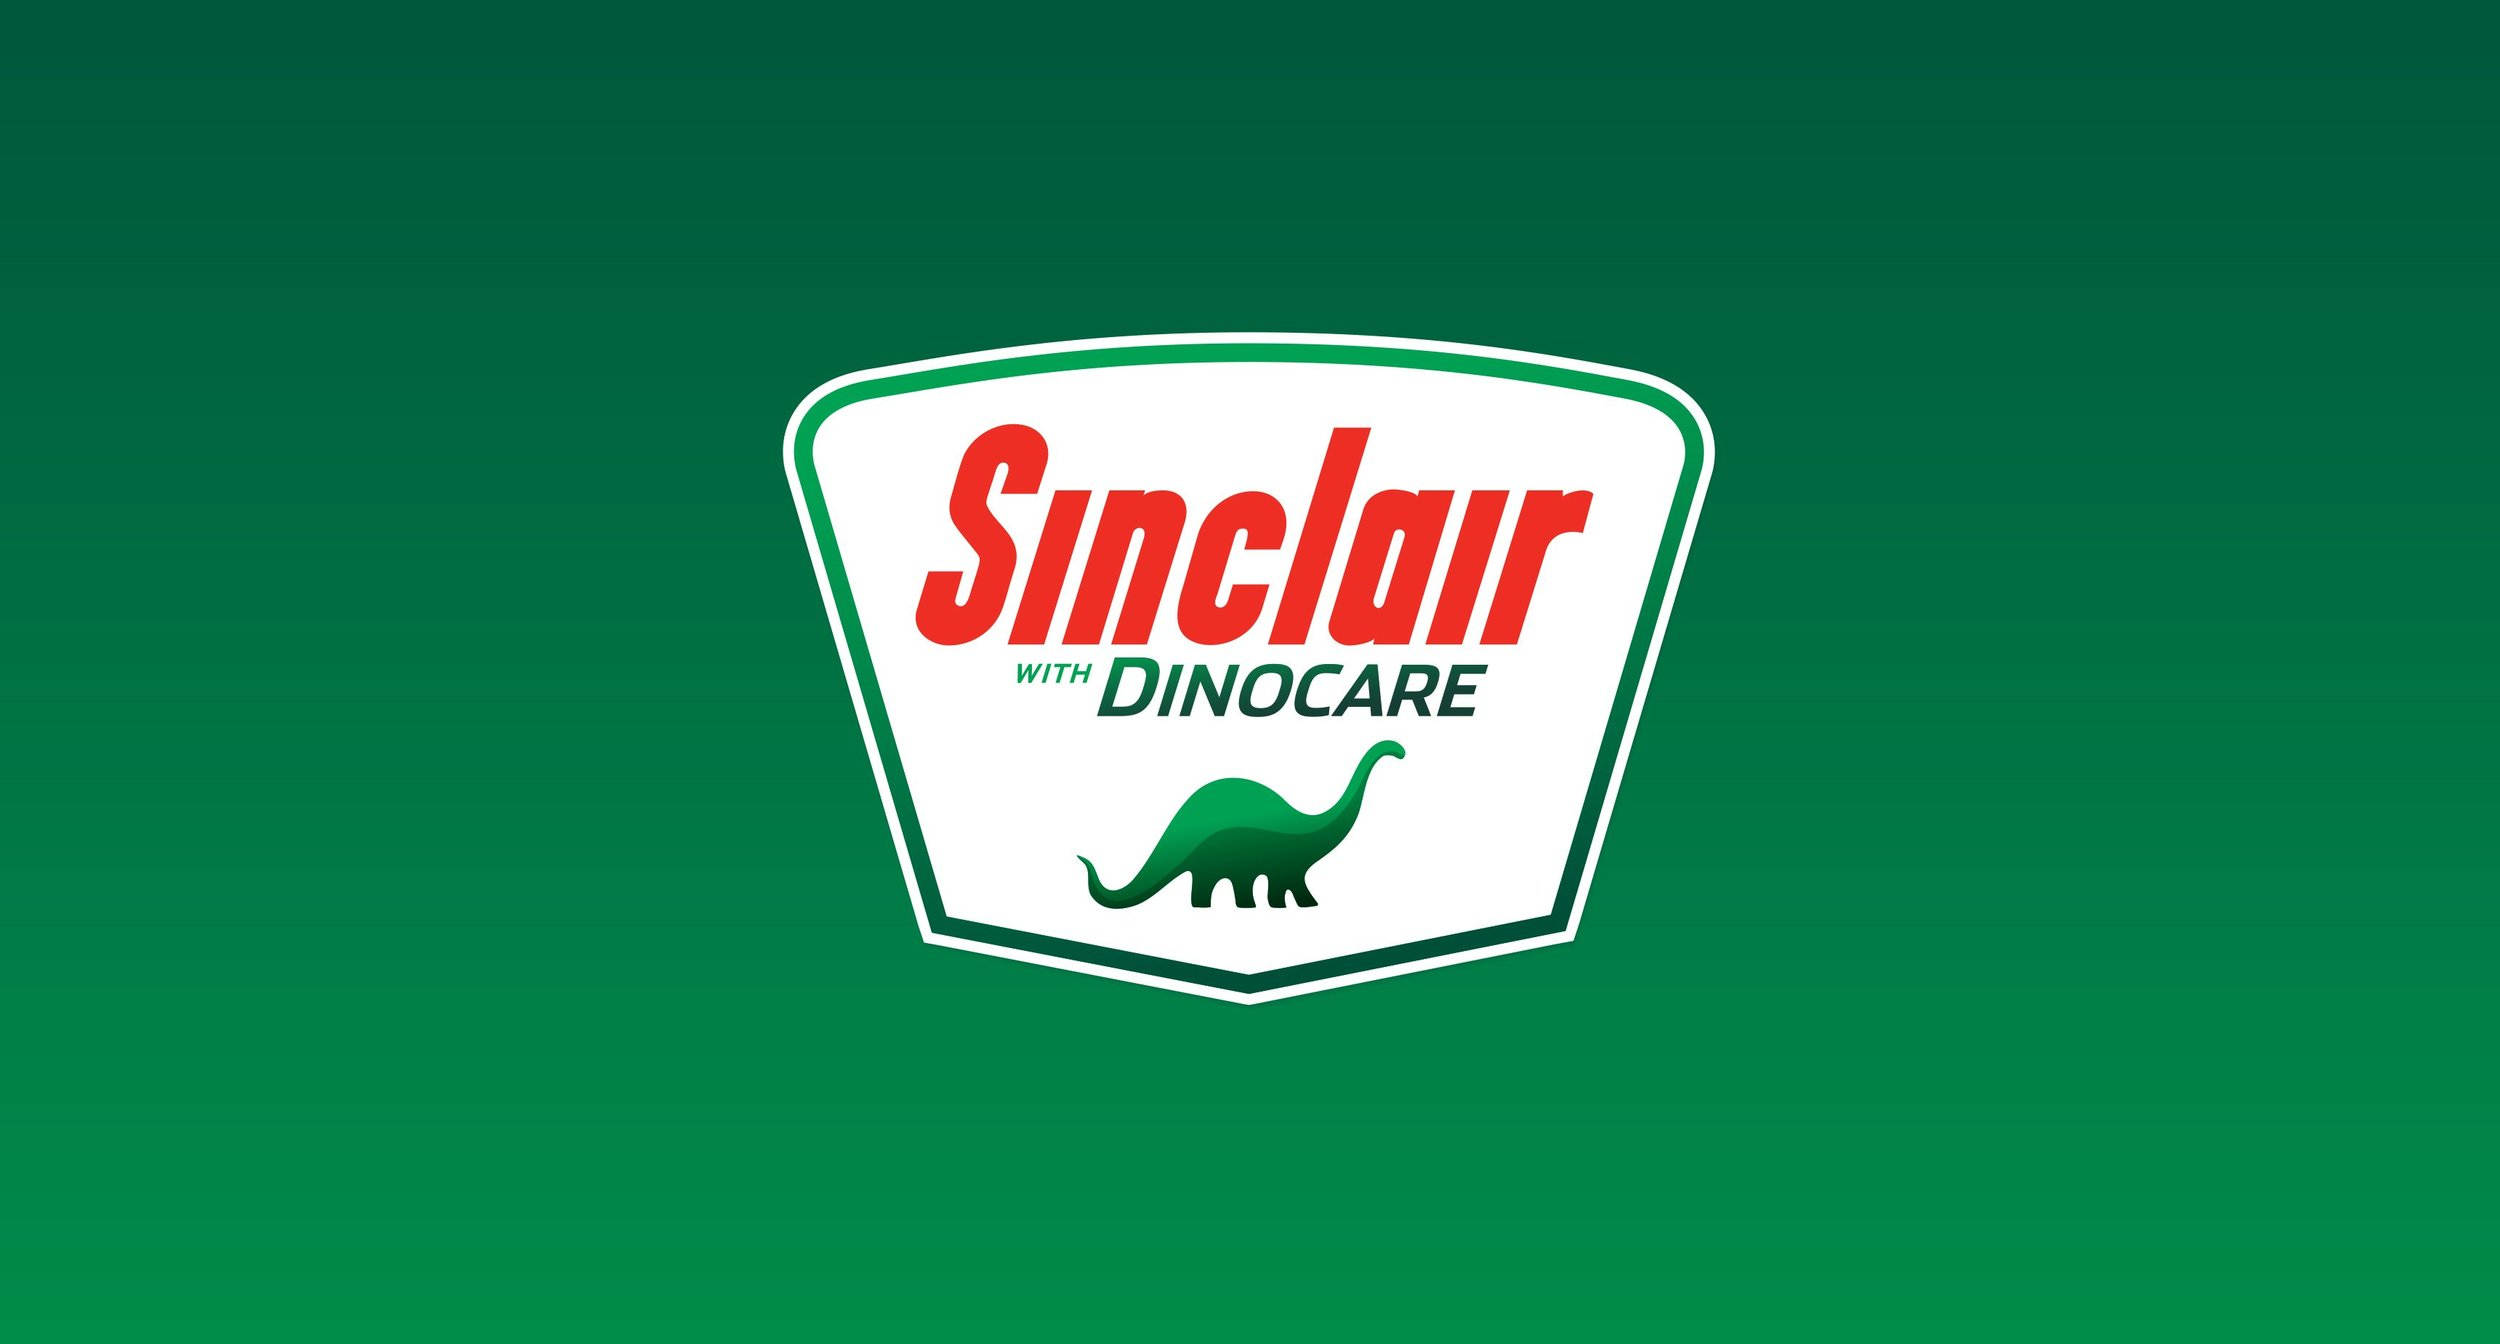 Sinclair with DinoCare Traditional Dinosaur logo